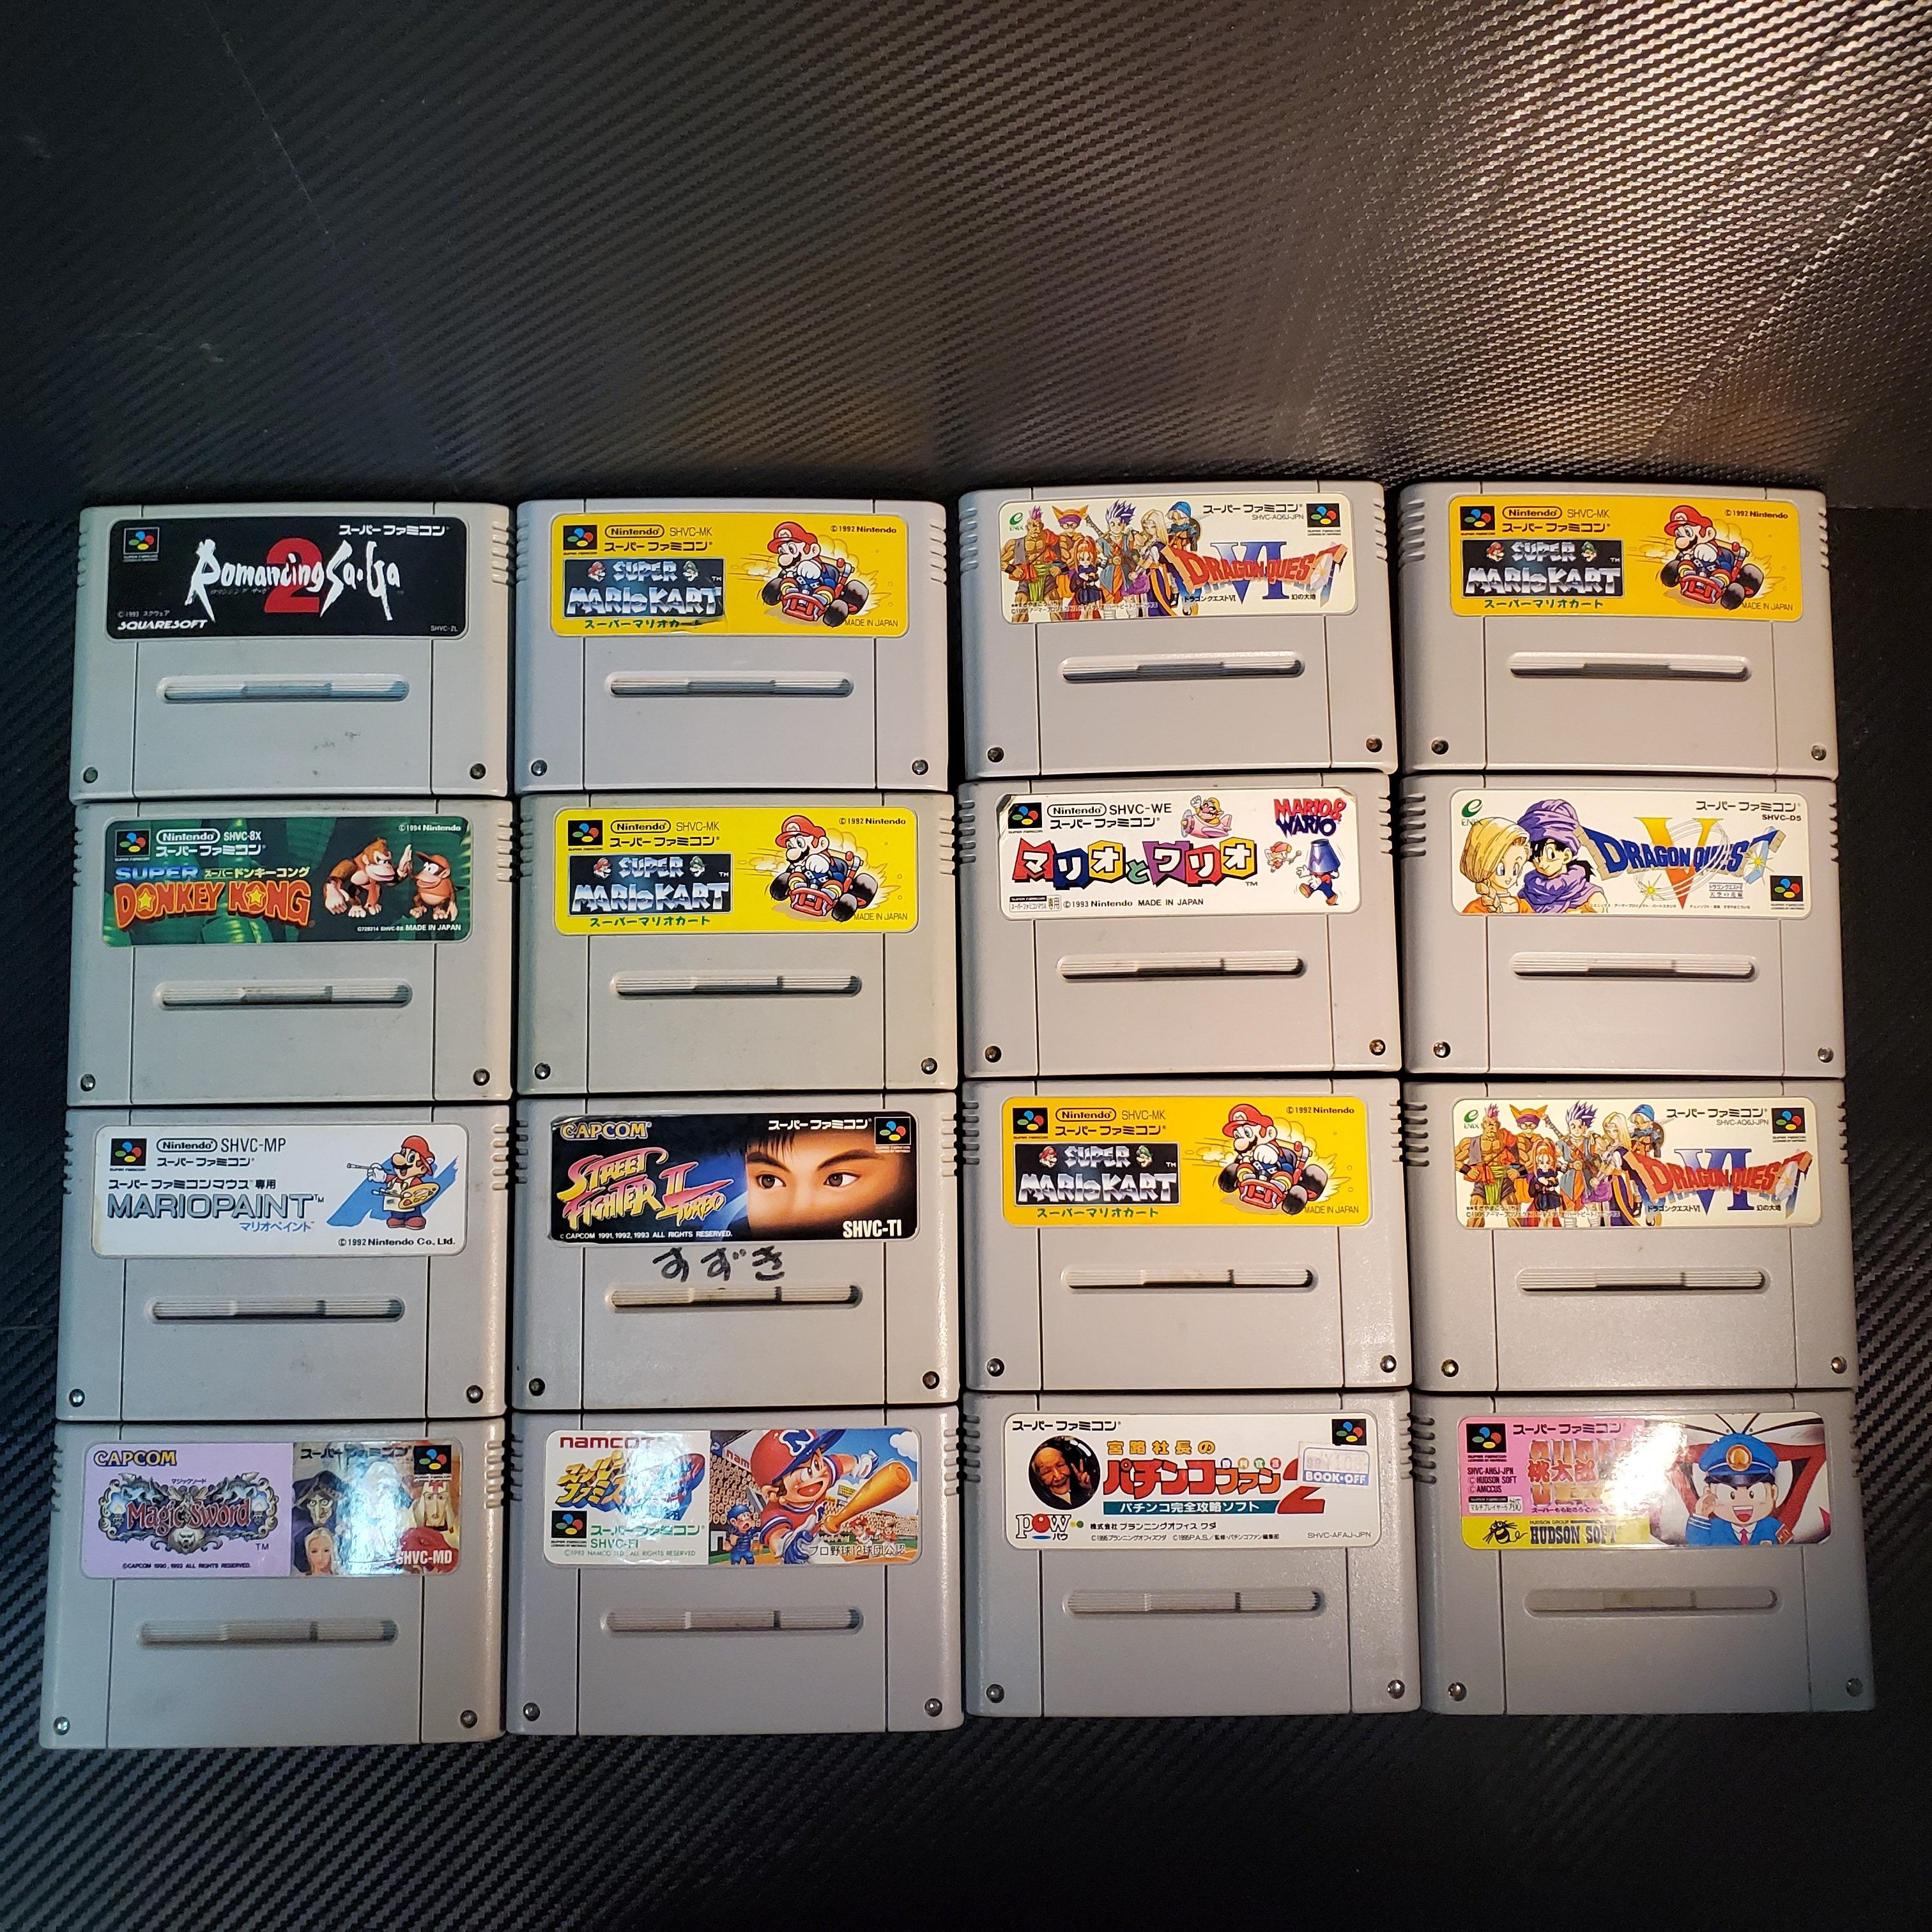 [VDS] Nostalgeek Store — Super Famicom / GBA / GB / Nintendo 64 / GameCube 201005105042703607